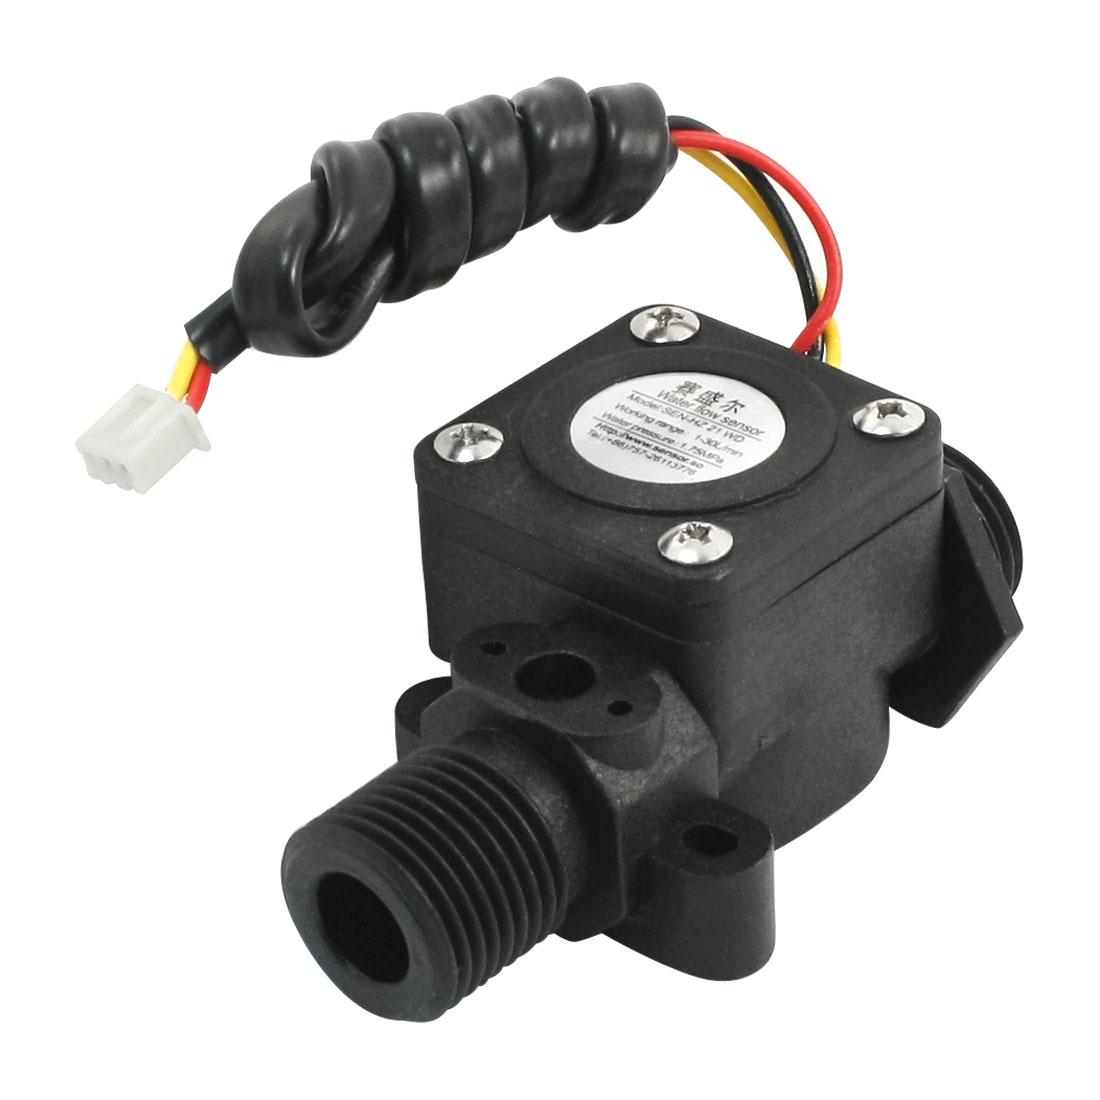 SEN-HZ21WD G1/2 Port 1.75Mpa Hall Flow Sensor Water Control Flowmeter 1-30L/min